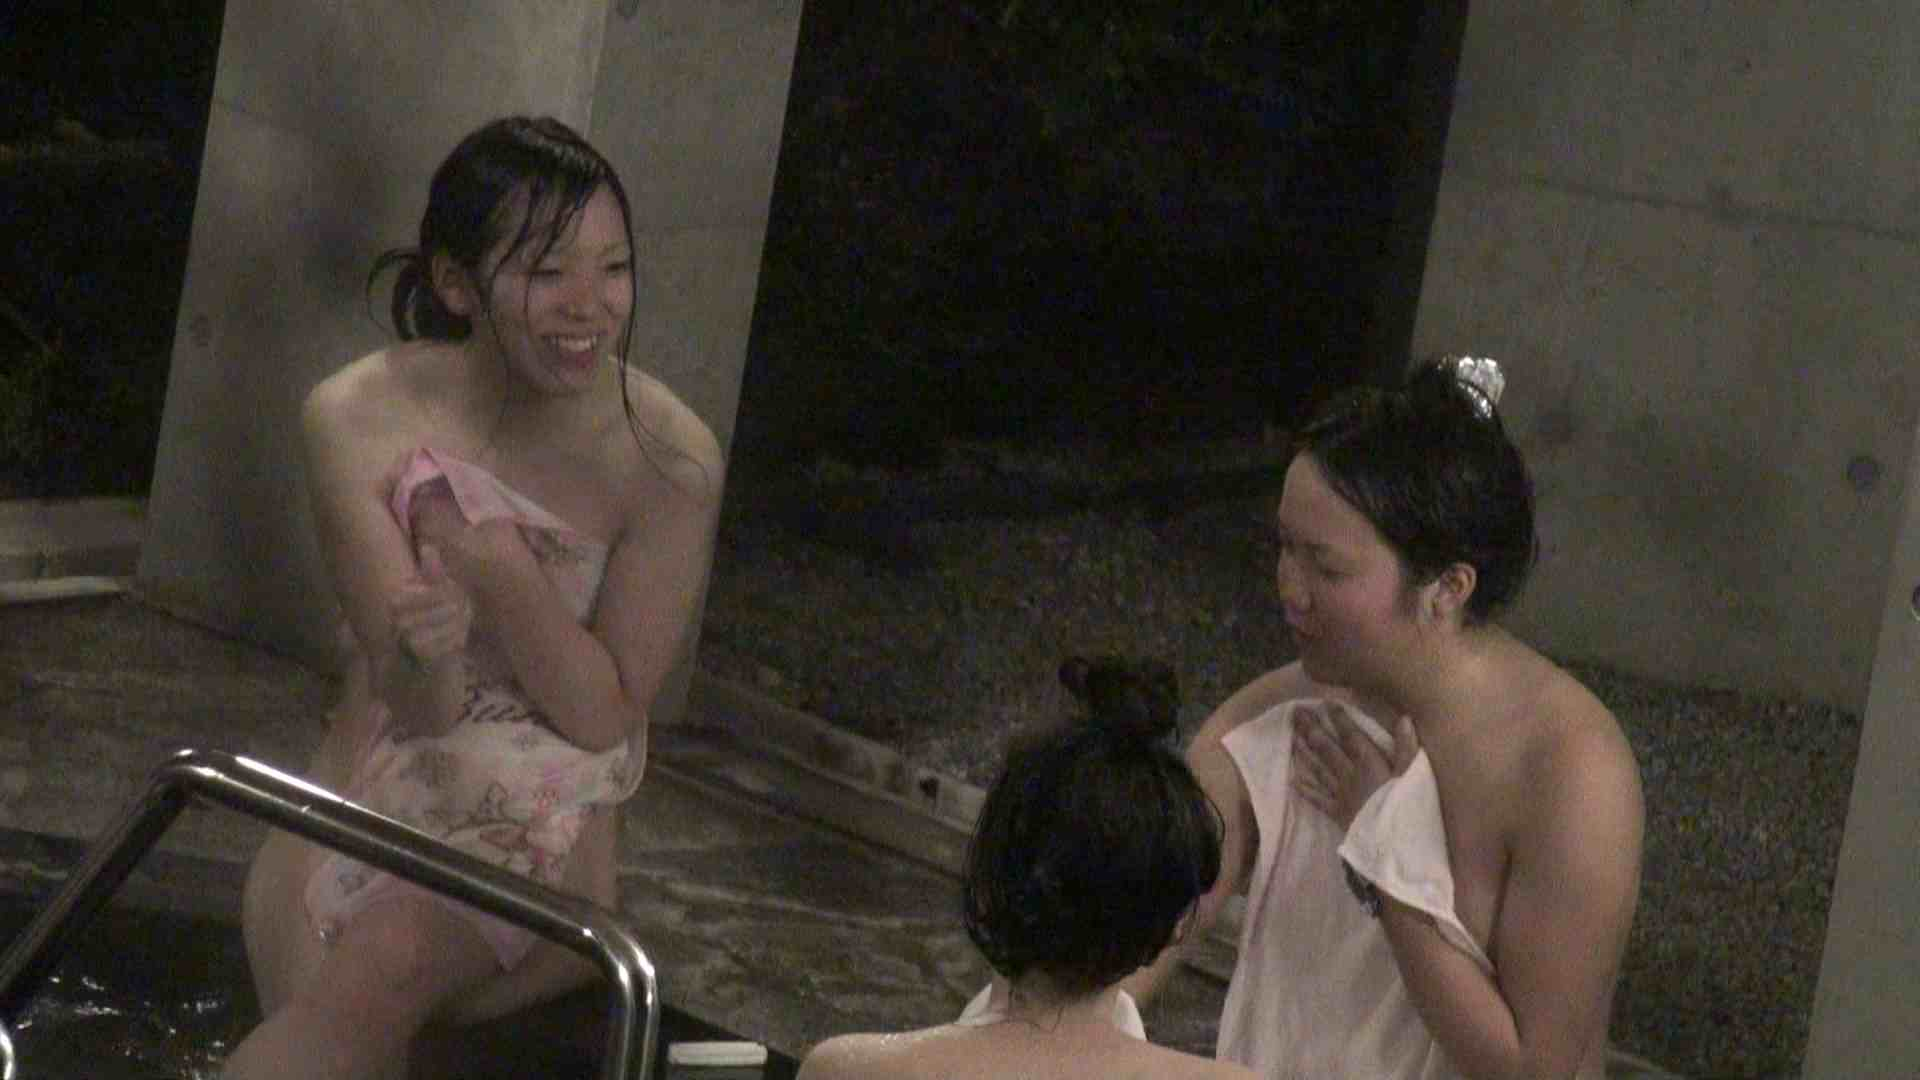 Aquaな露天風呂Vol.383 OLセックス 覗き性交動画流出 103画像 47